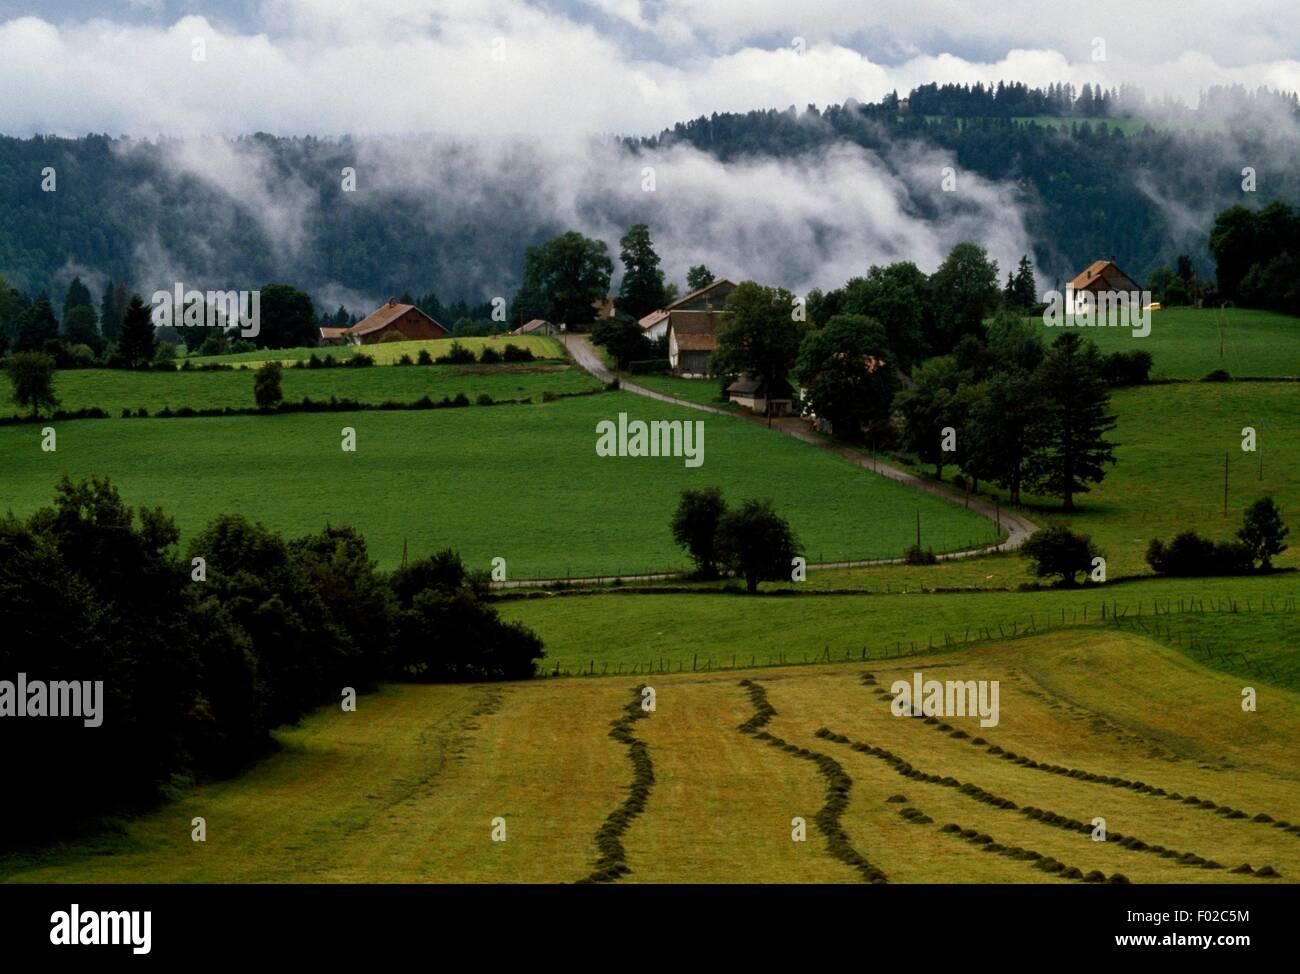 Landscape, Doubs Valley, Jura Mountains Regional Natural Park (Parc naturel regional du Haut-Jura), France. - Stock Image